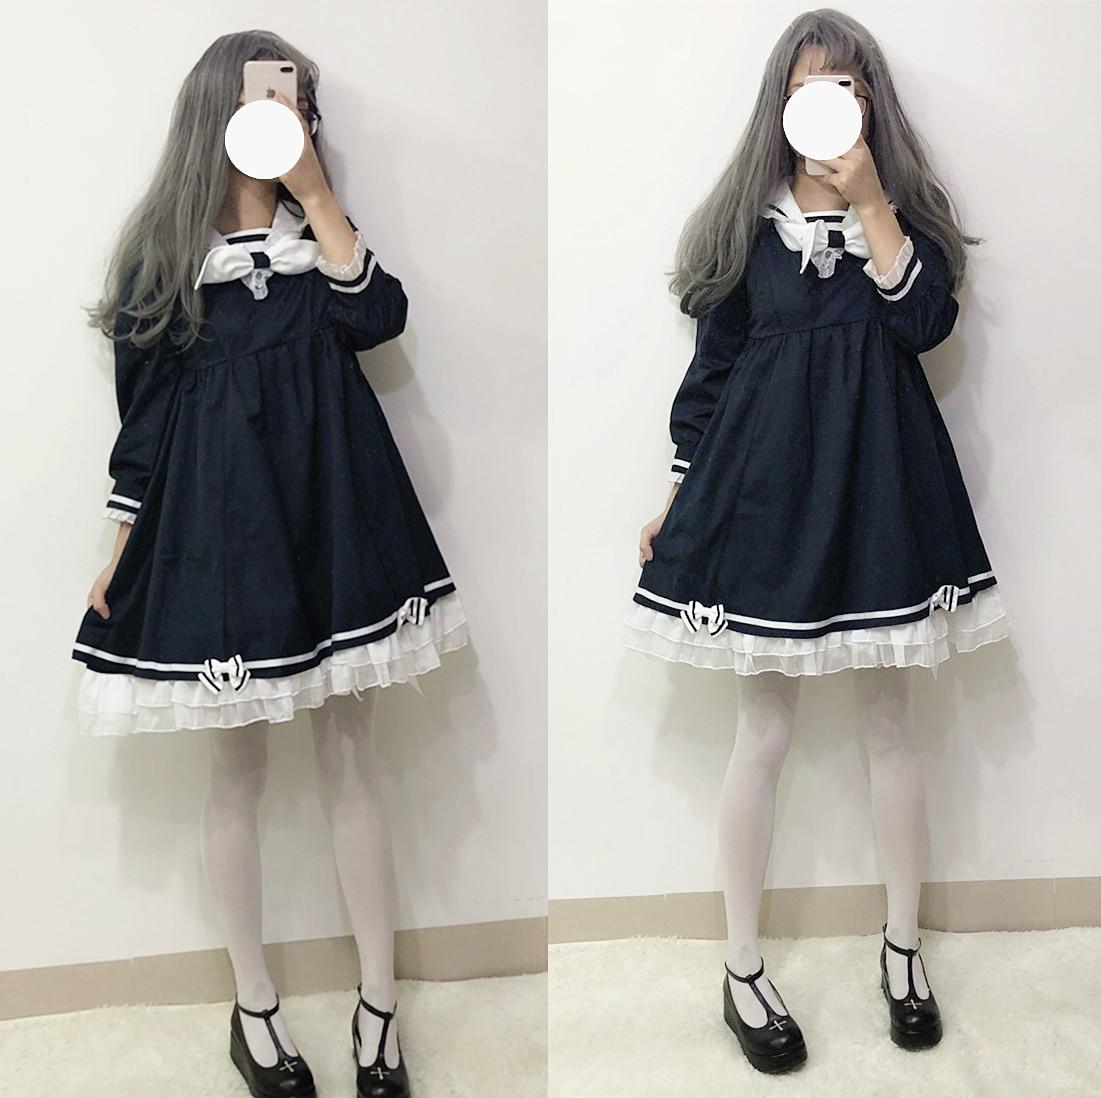 Harajuku Sailor Collar Navy Lace Dress Japanese Lolita JK Fashion Bow Soft Sister Girl Lovely Kawaii